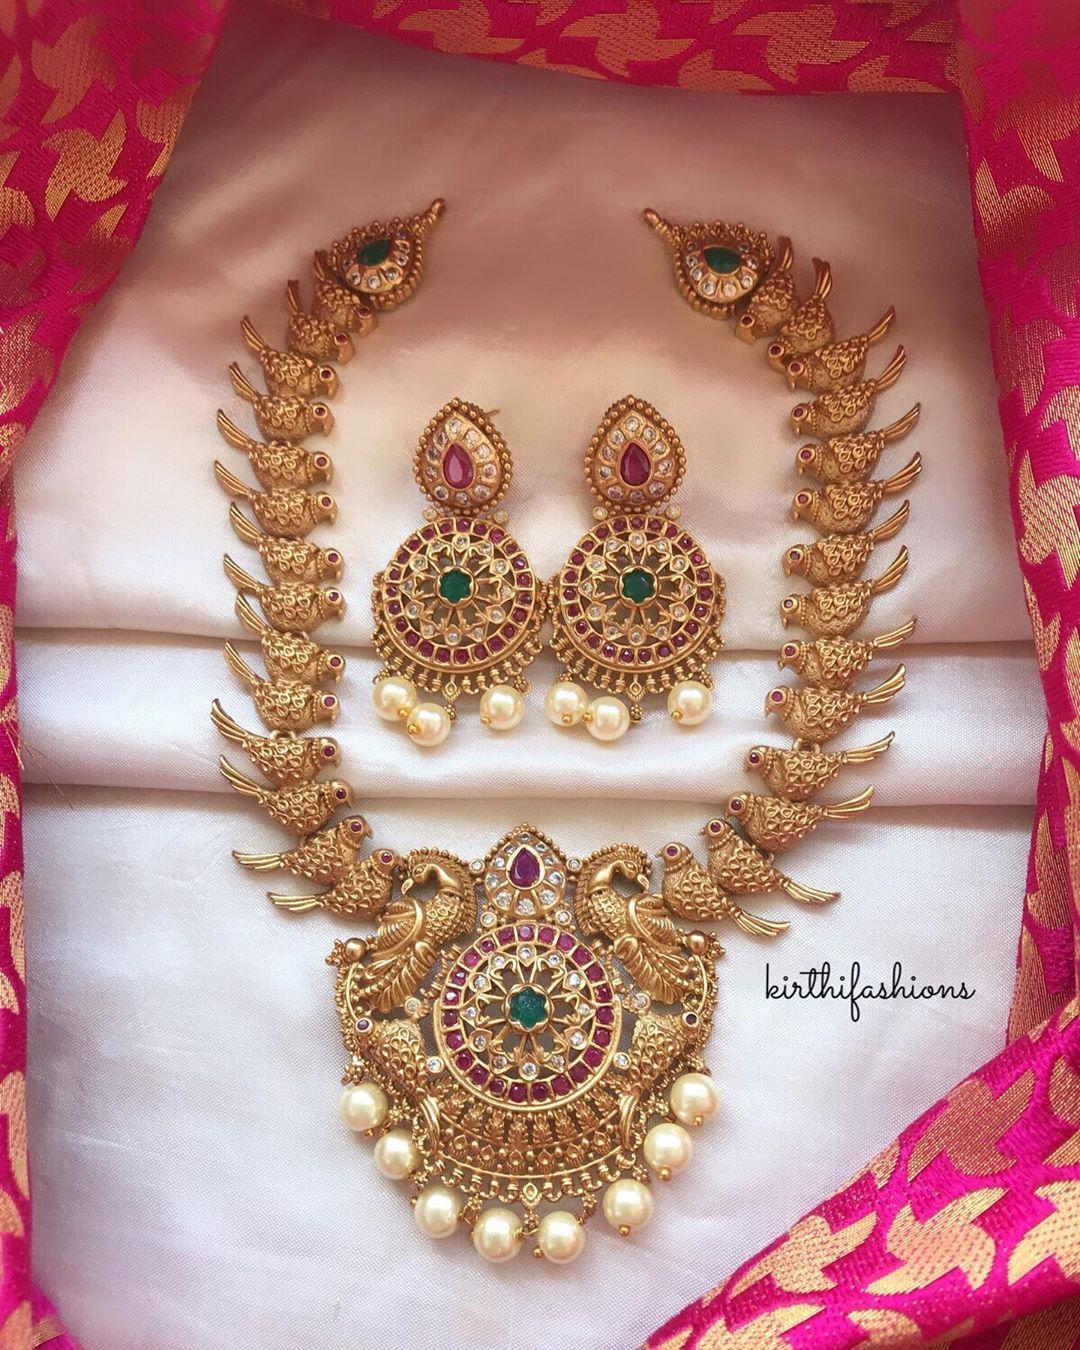 imitation-jewellery-online-shopping-9